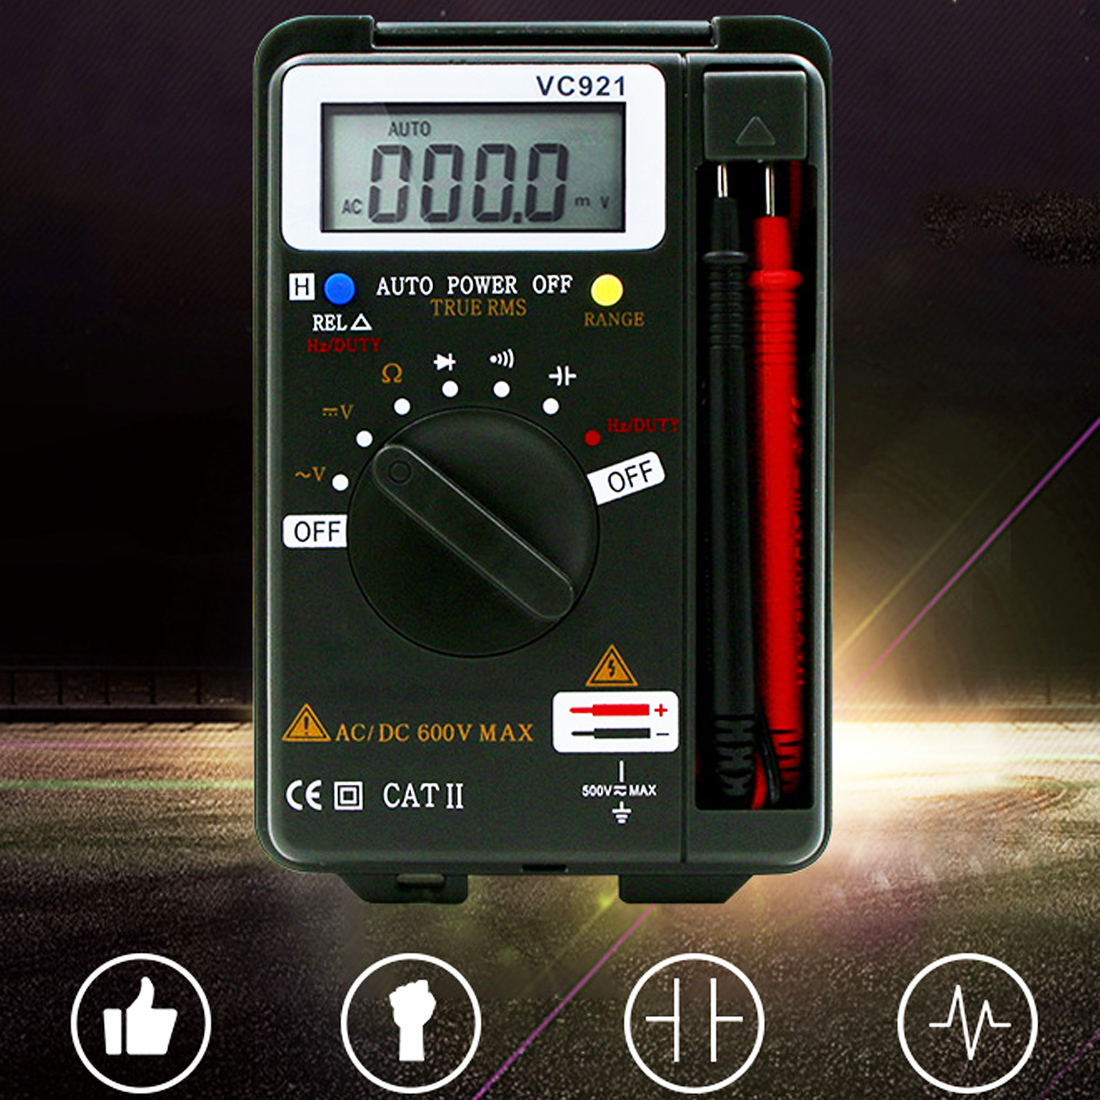 hot Handheld Pocket Digital Multimeter VC 921 DMM Integrated Personal Mini